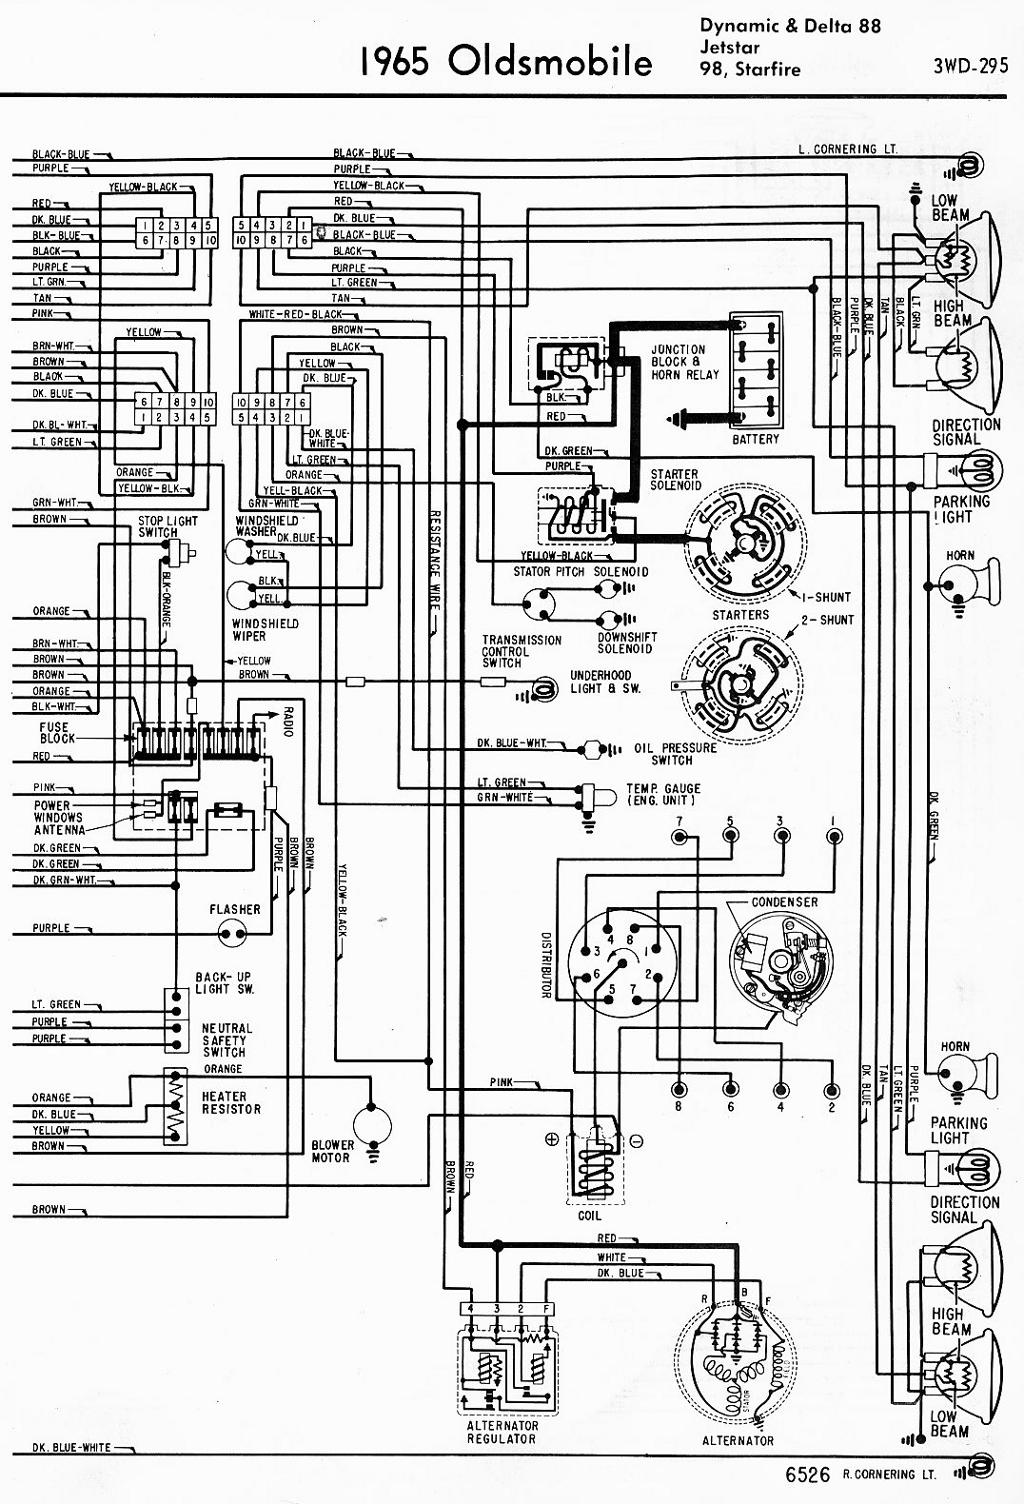 98 isuzu npr wiring diagram 98 jeep cherokee wiring isuzu truck wiring diagram 98 isuzu rodeo wiring diagram [ 1024 x 1504 Pixel ]